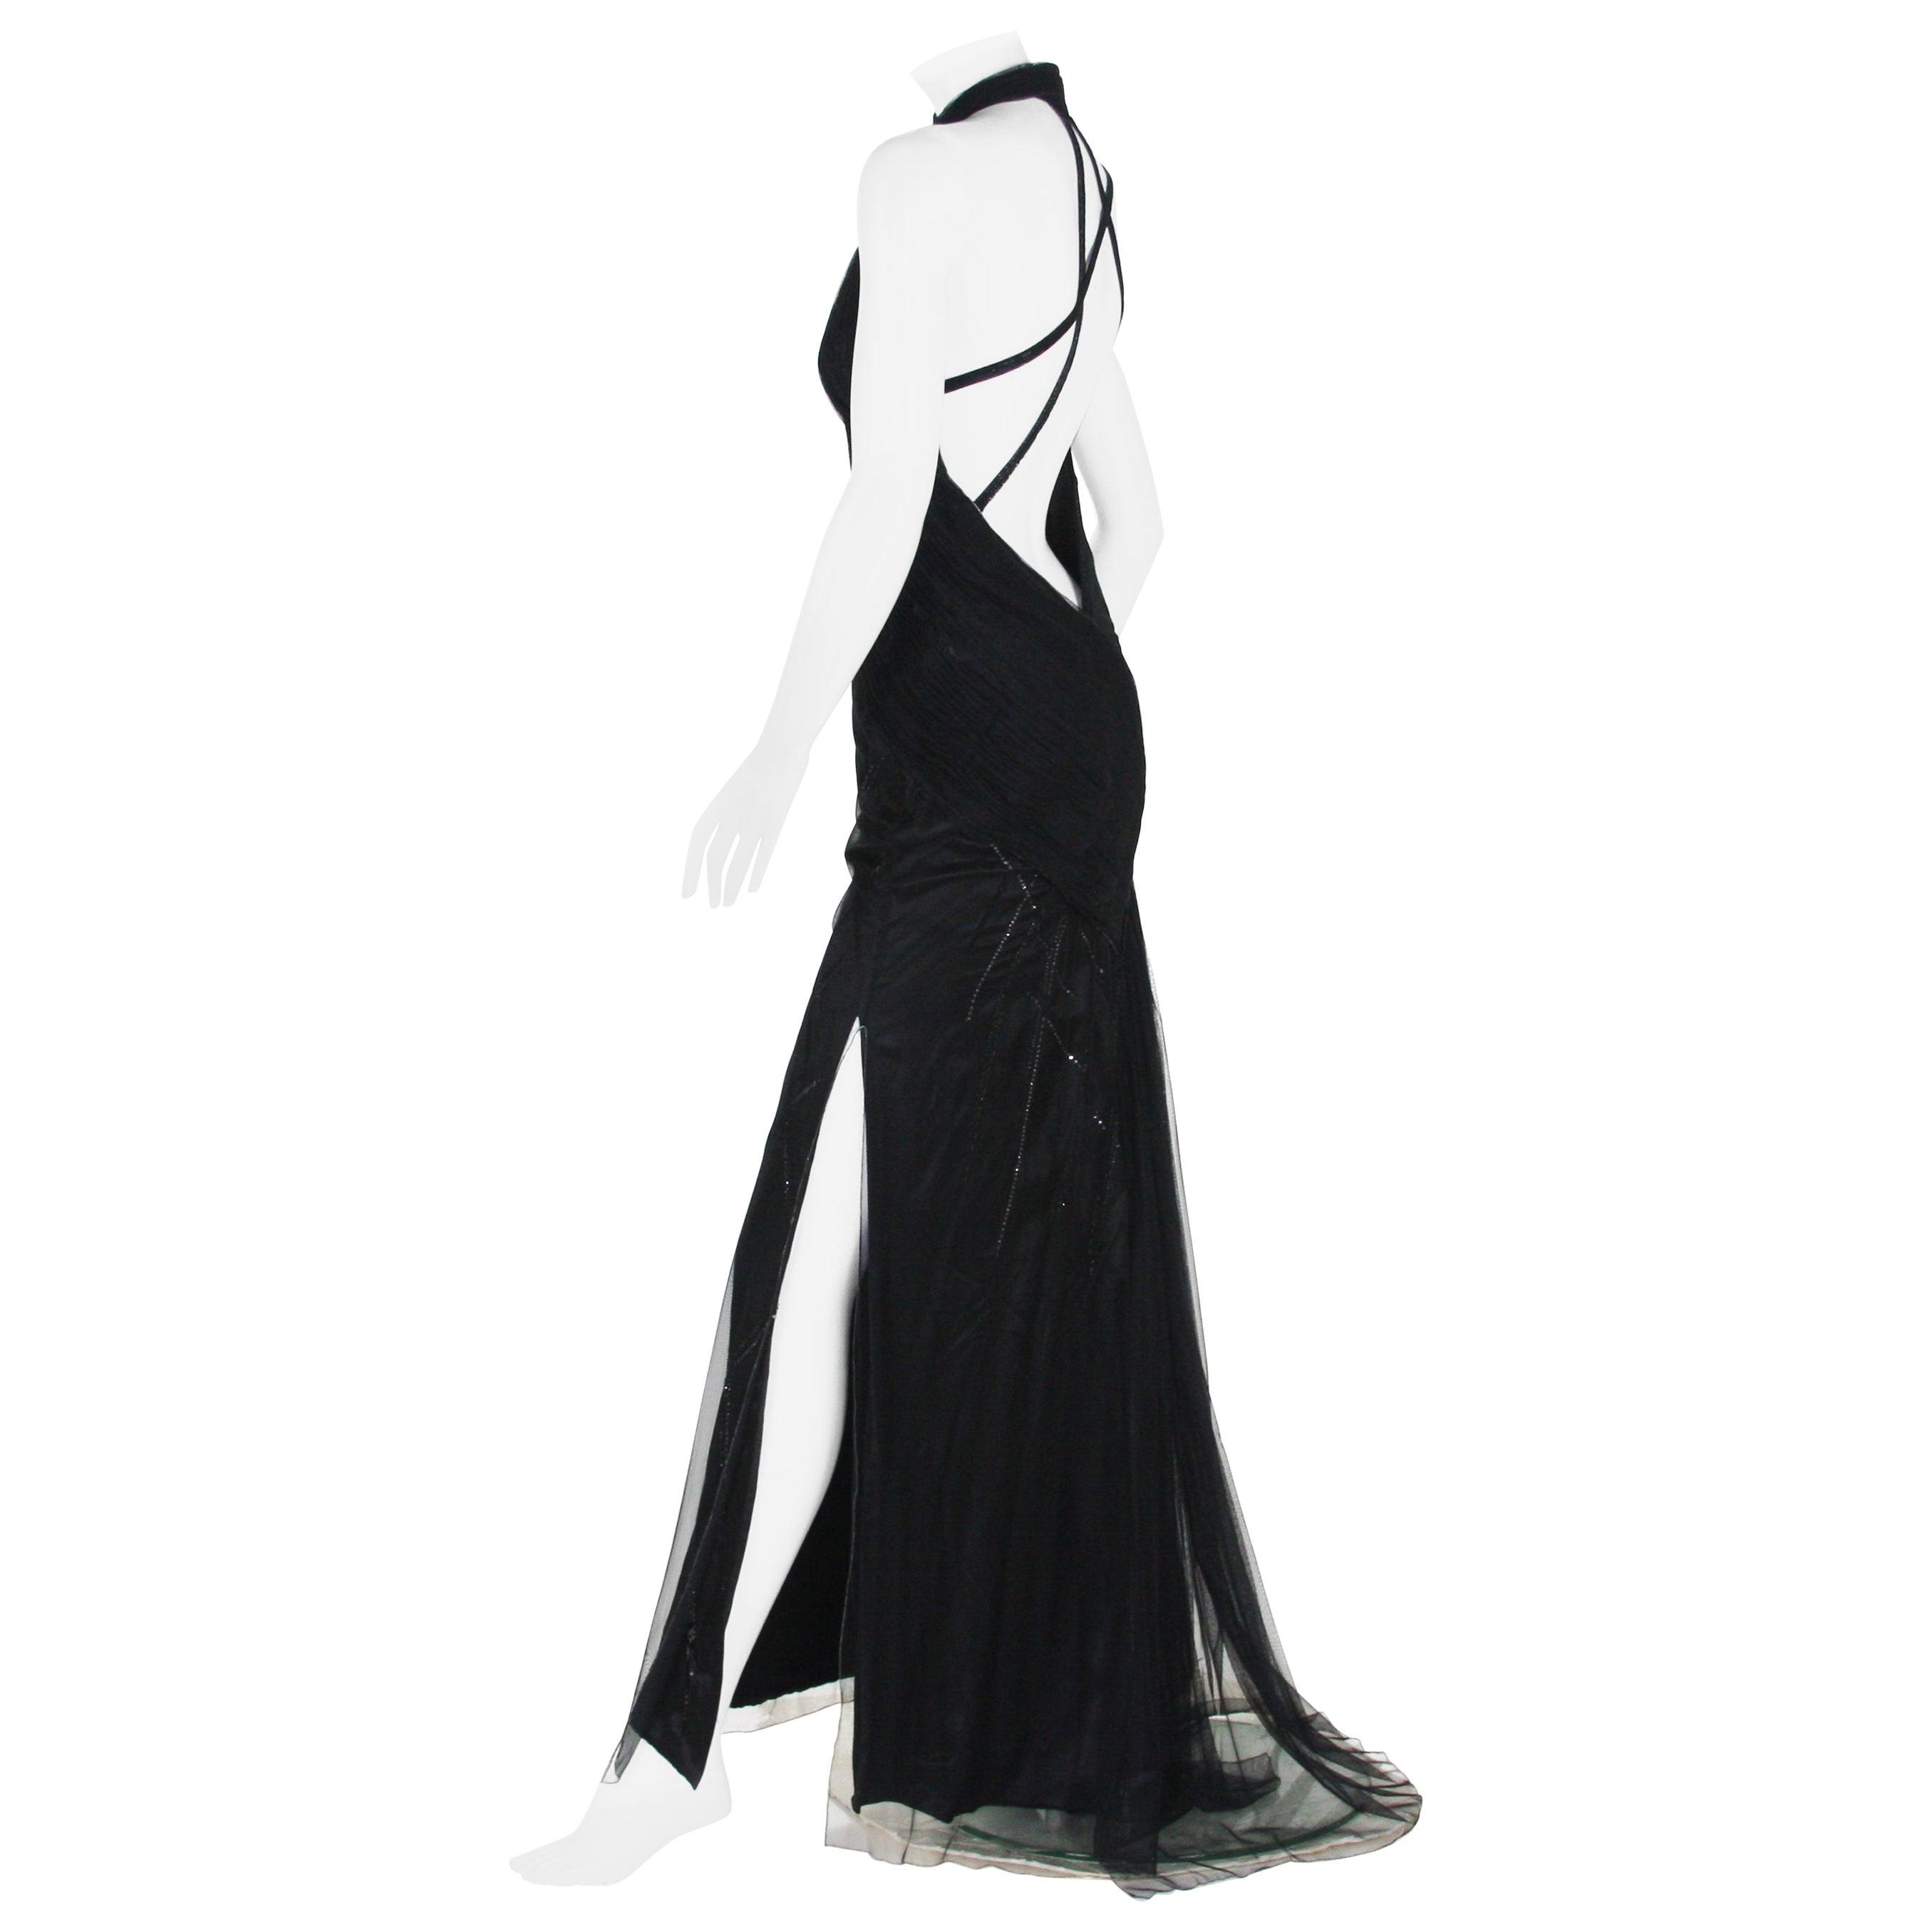 Versace Atelier 90's Black Silk Embellished Tulle Open Back Dress Gown